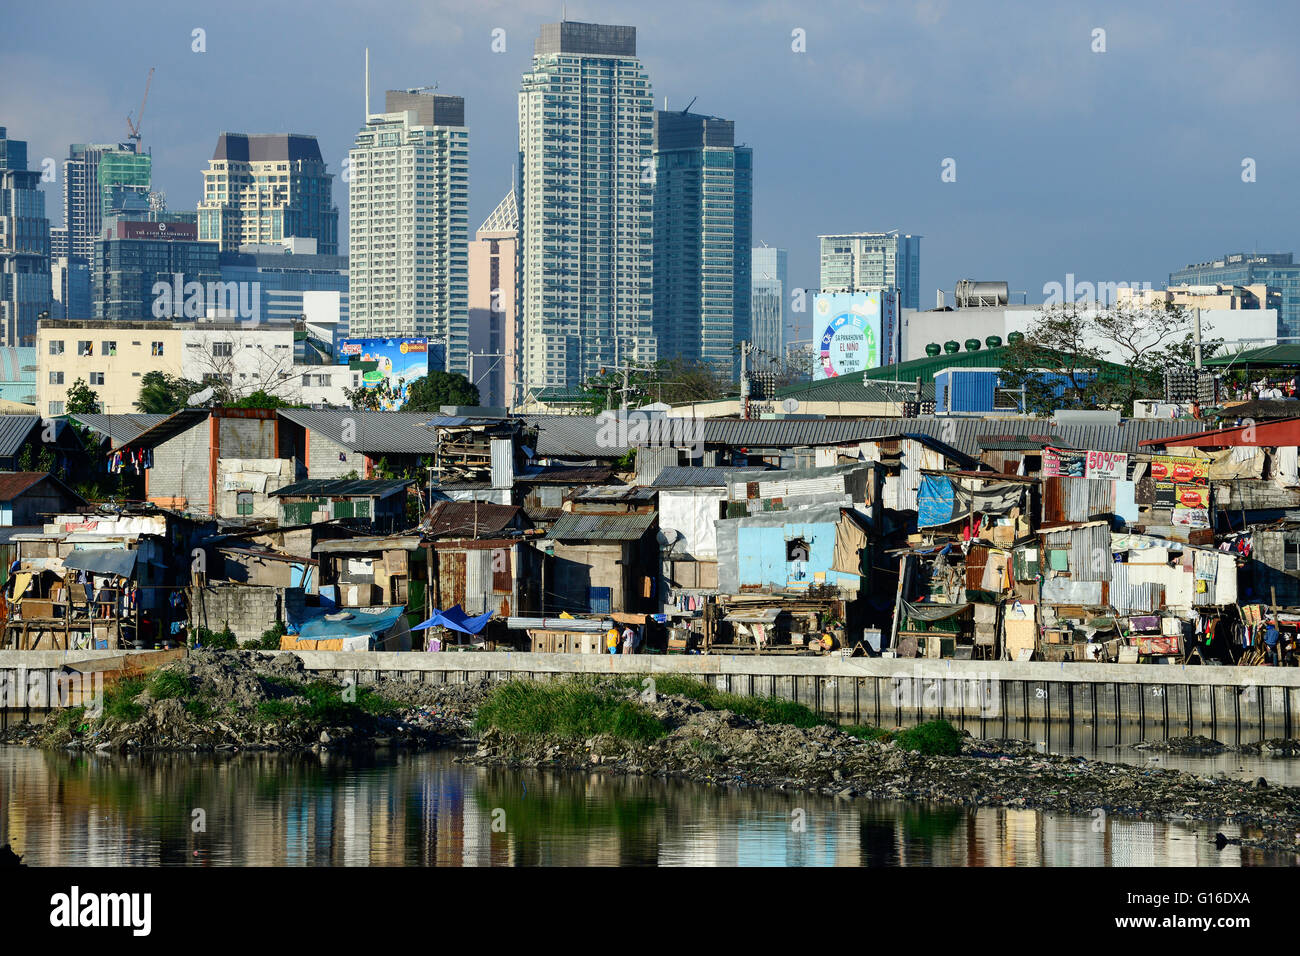 PHILIPPINES, Manila, Pasey, slum and construction of appartment towers / PHILIPPINEN, Manila, Pasey, Slumhuetten - Stock Image